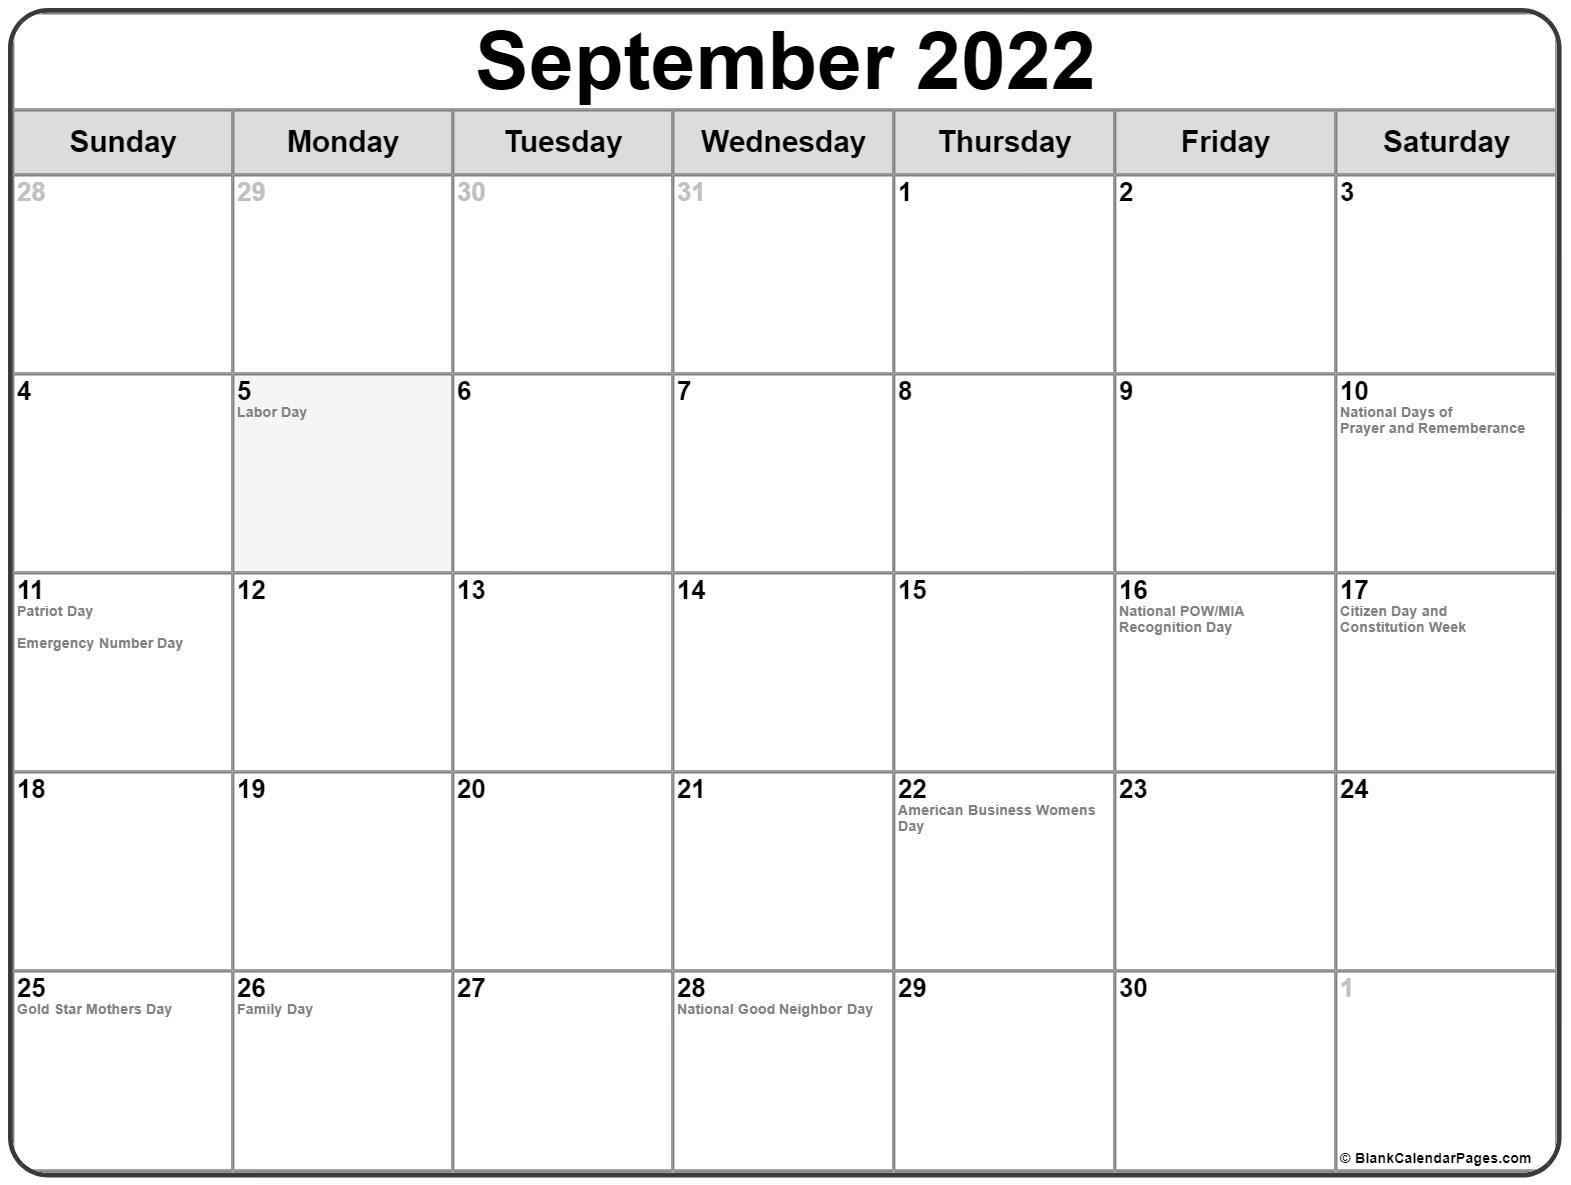 September 2022 With Holidays Calendar